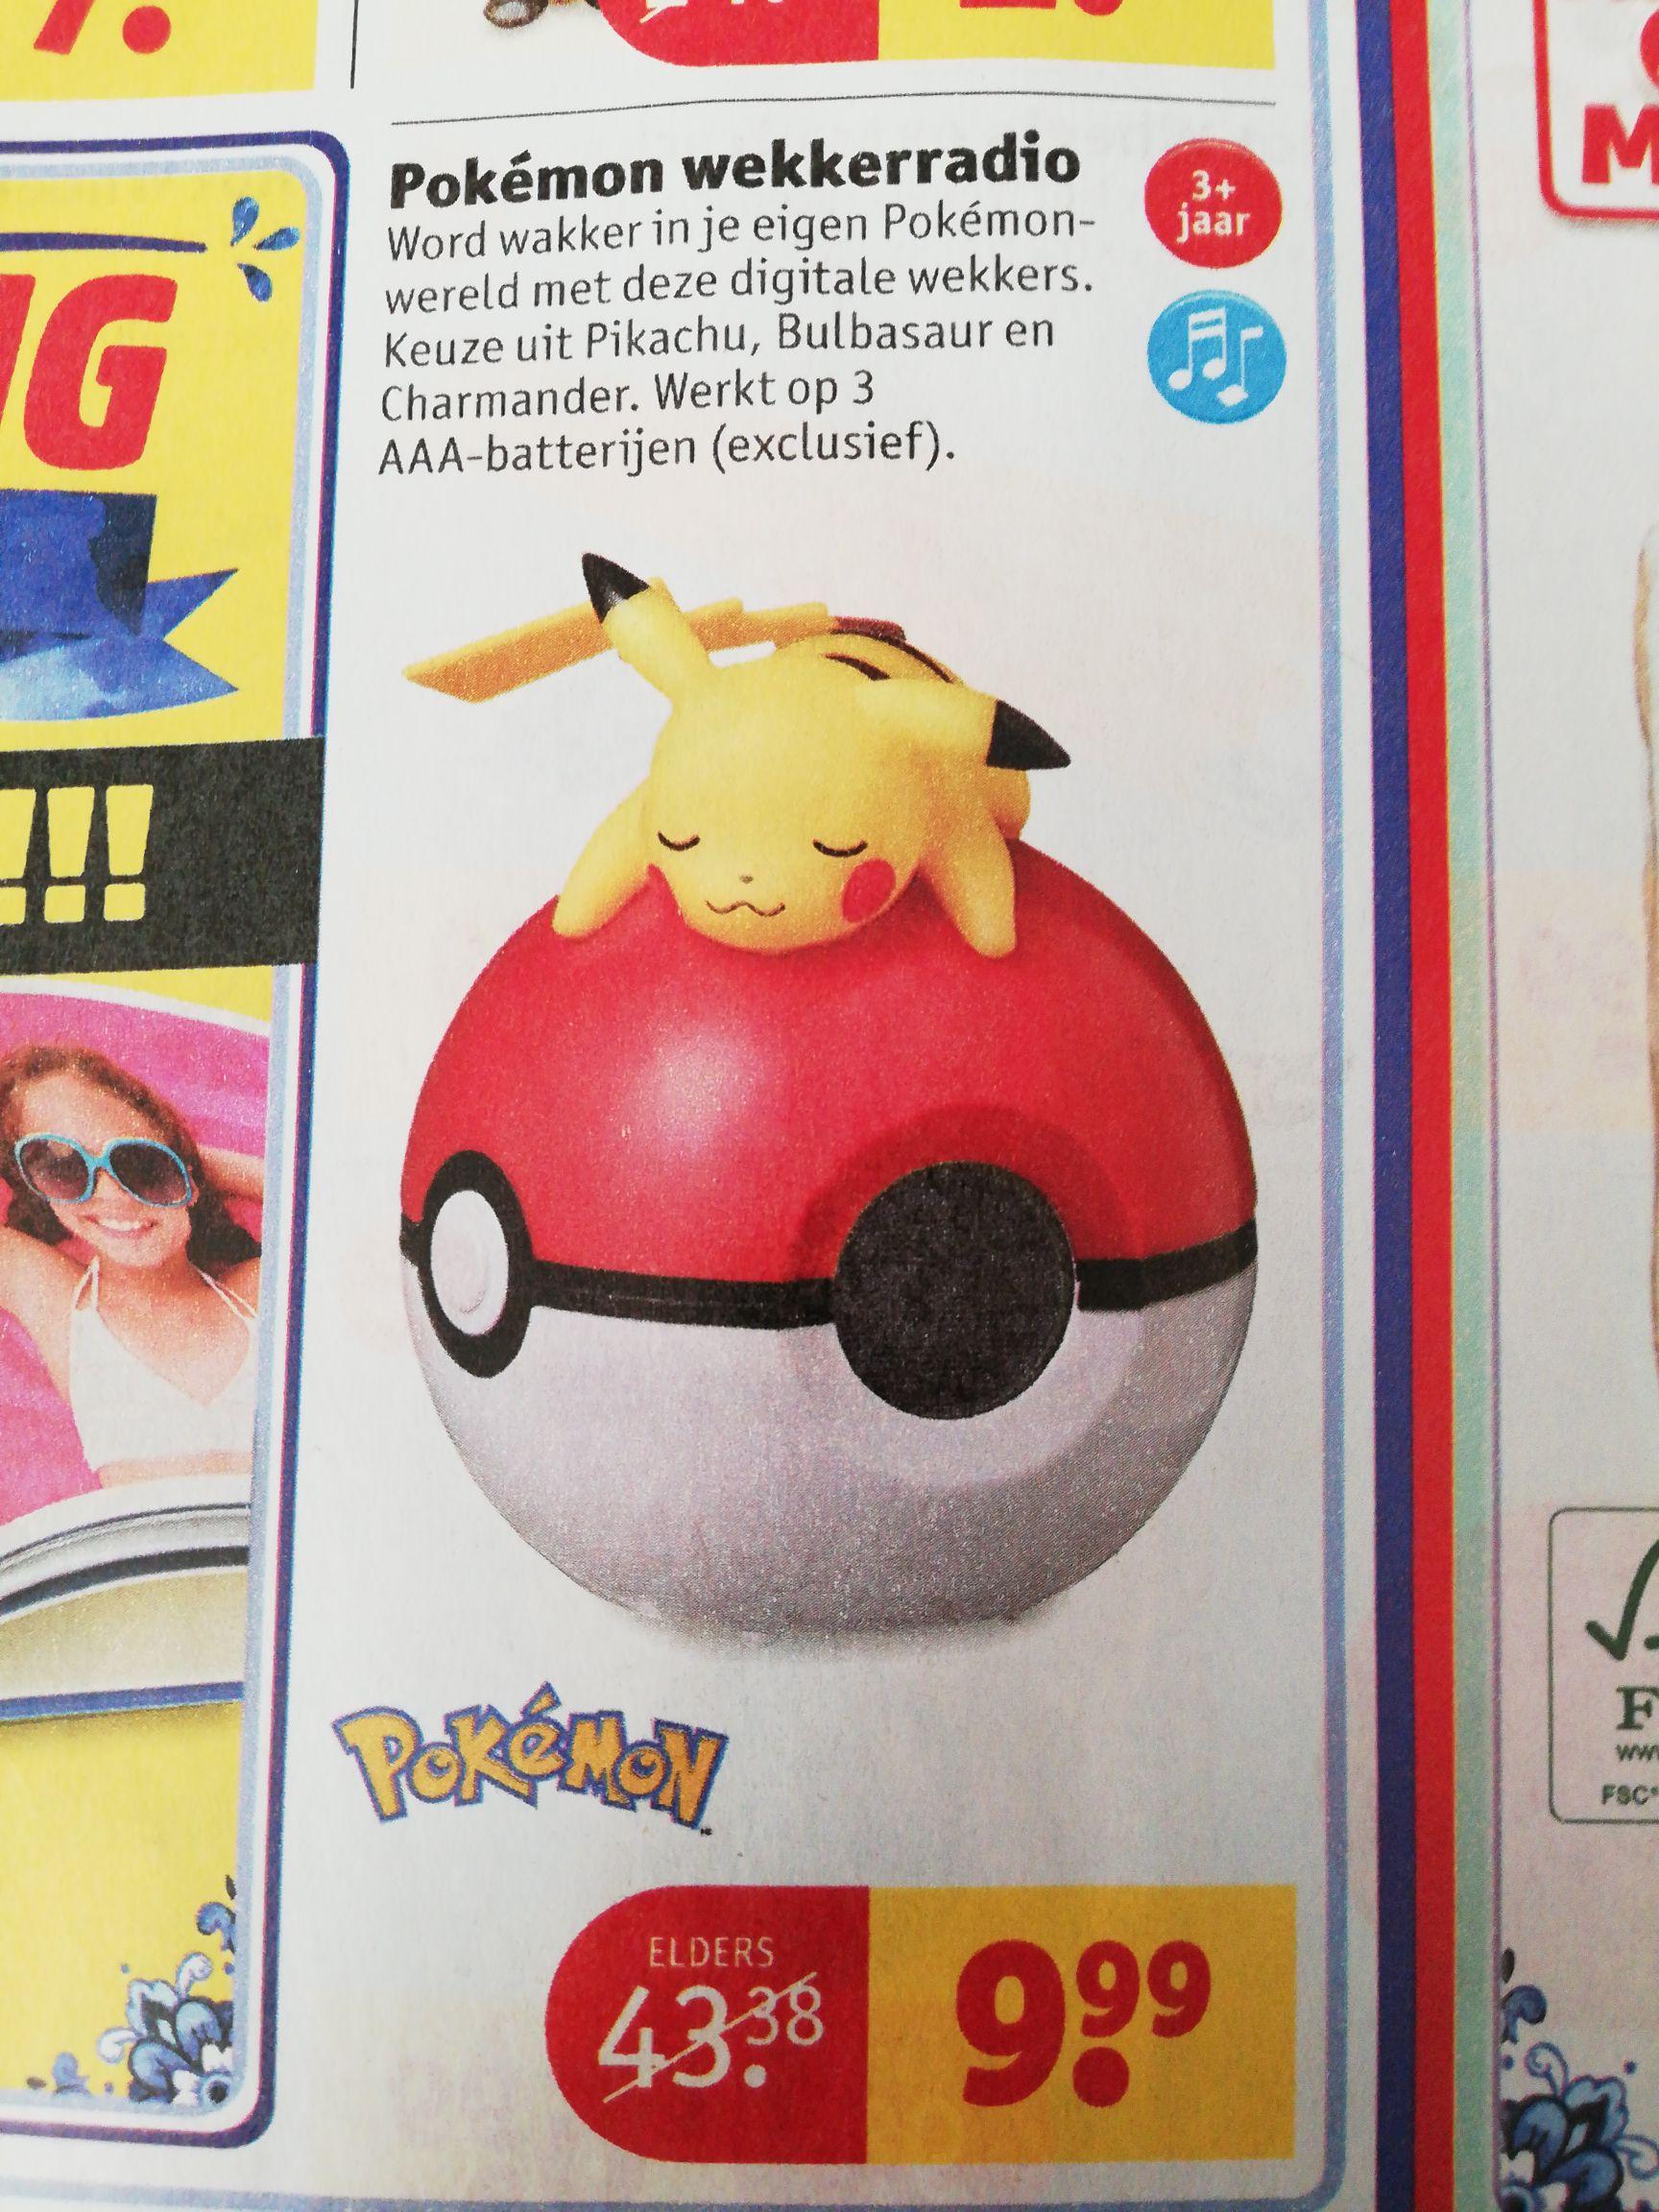 Pokémon wekkerradio @kruidvat